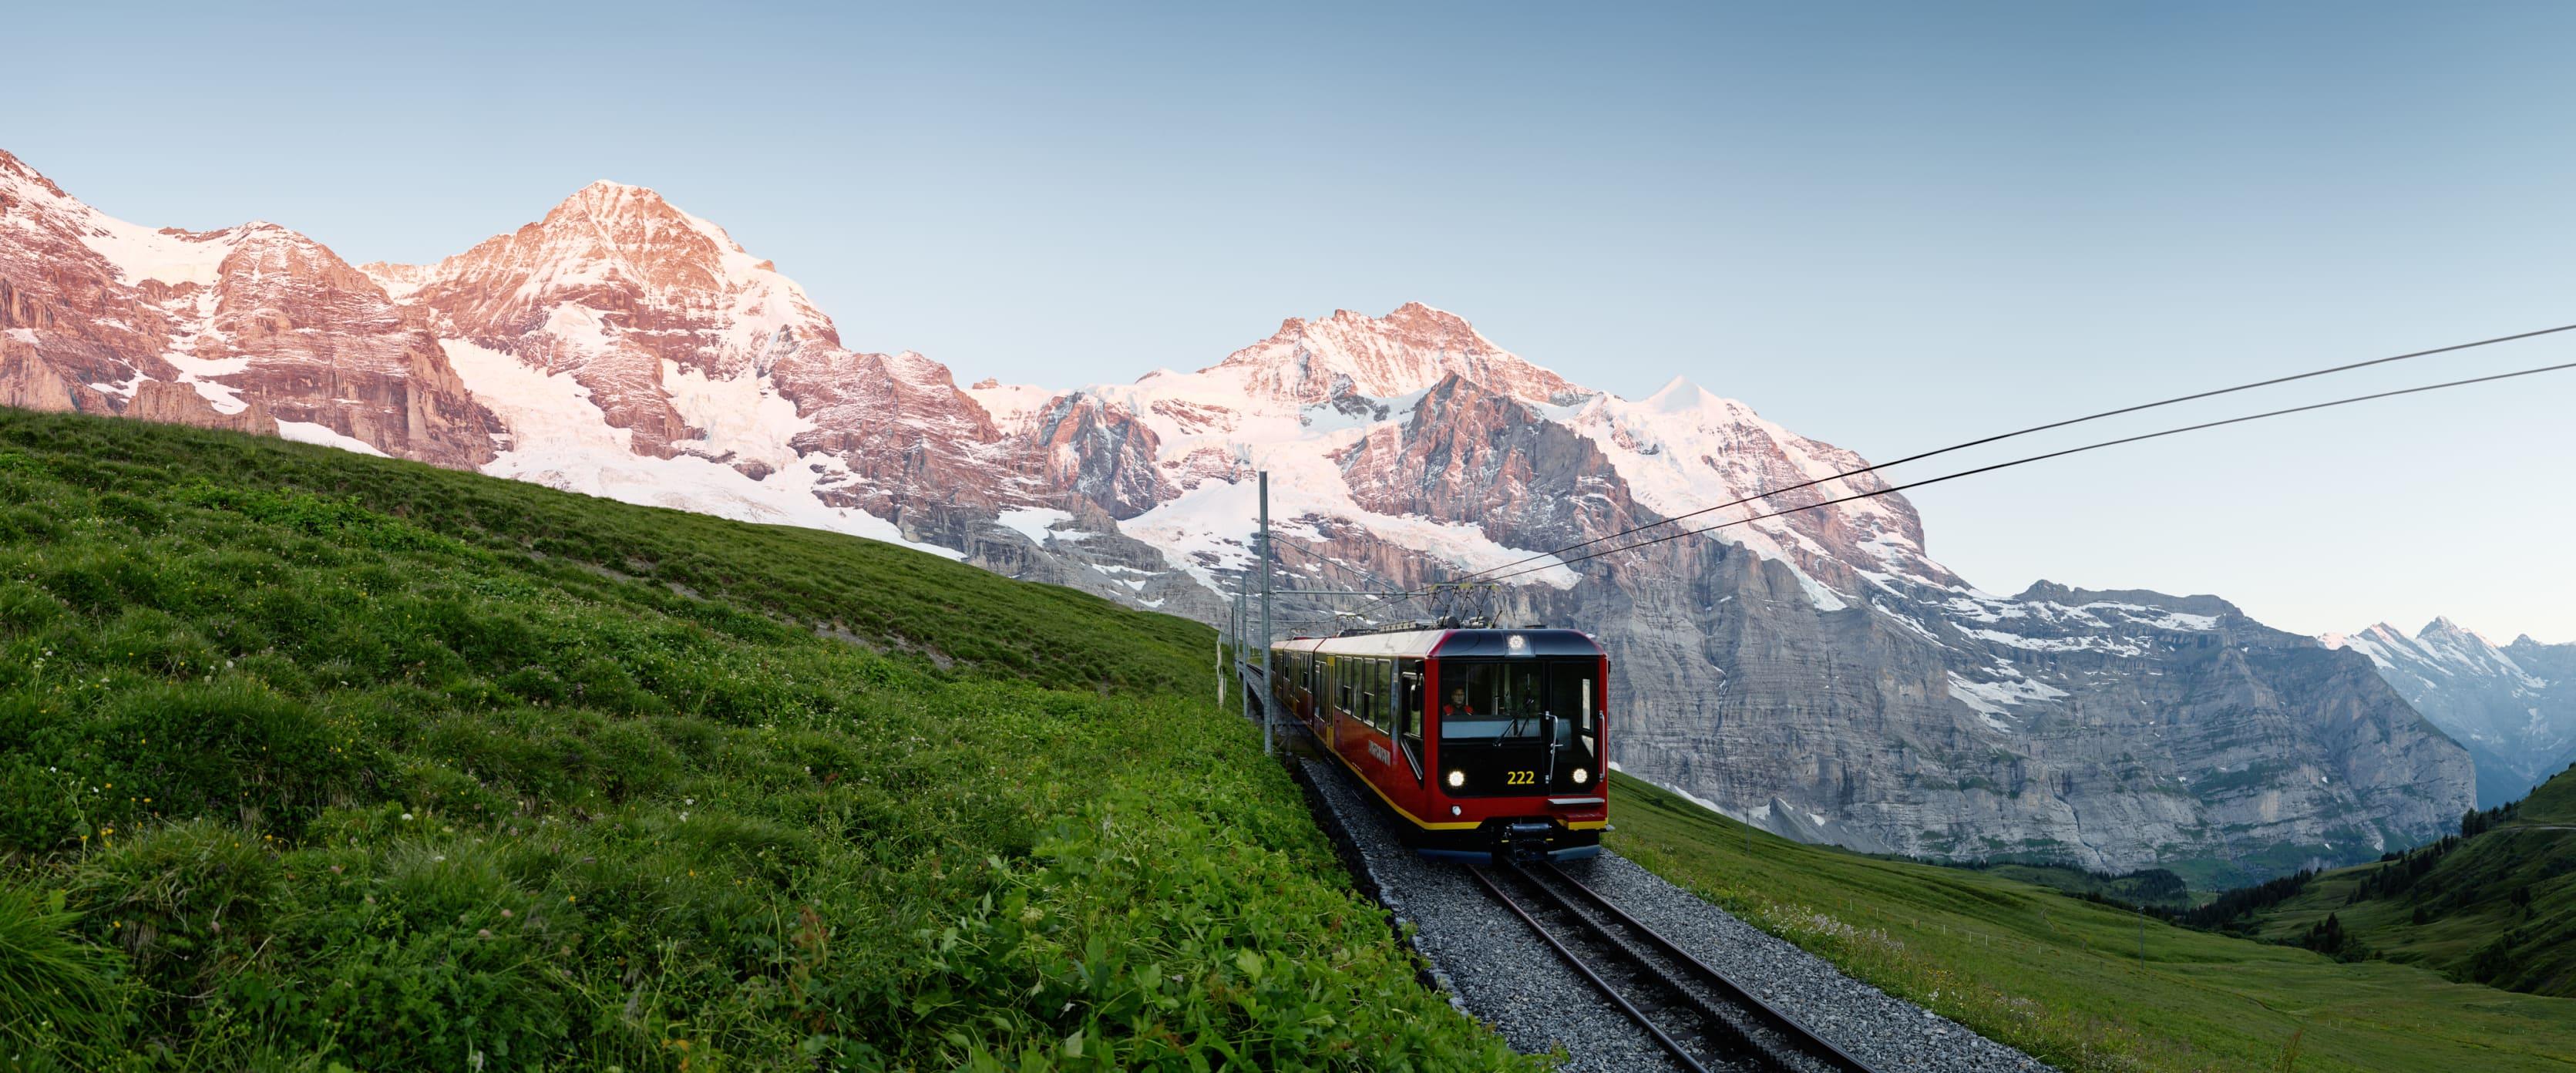 Jungfraubahn Eiger Moench Jungfrau Alp